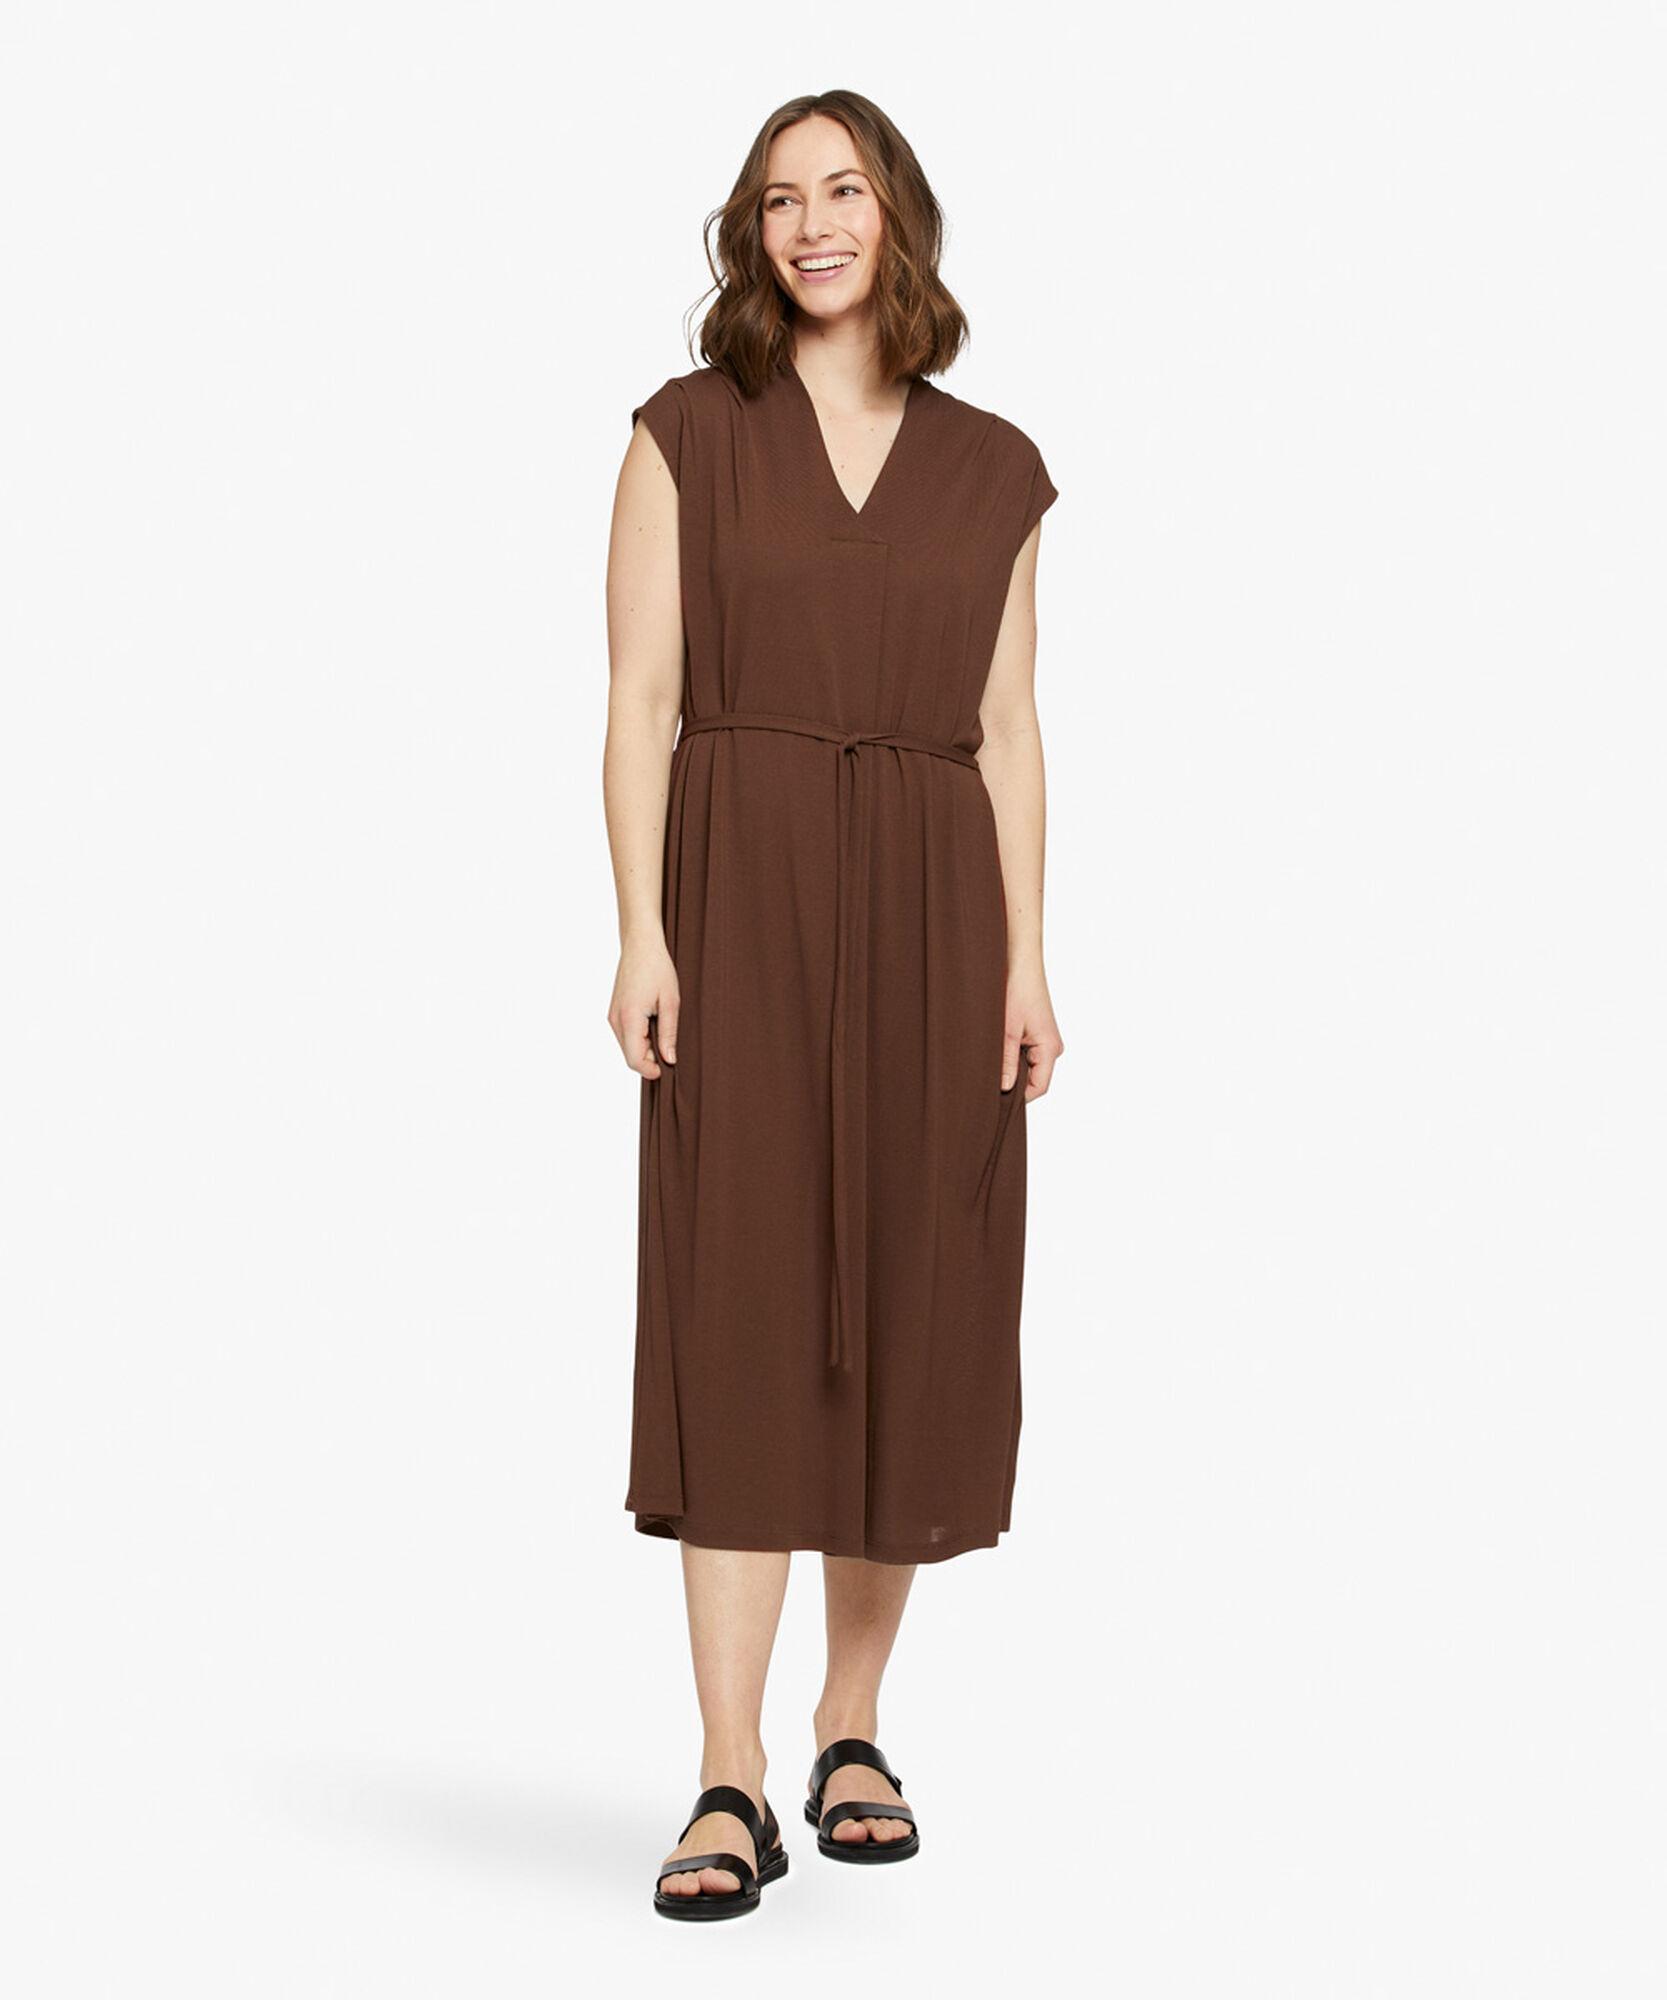 OTALIA DRESS, Tiramisu, hi-res